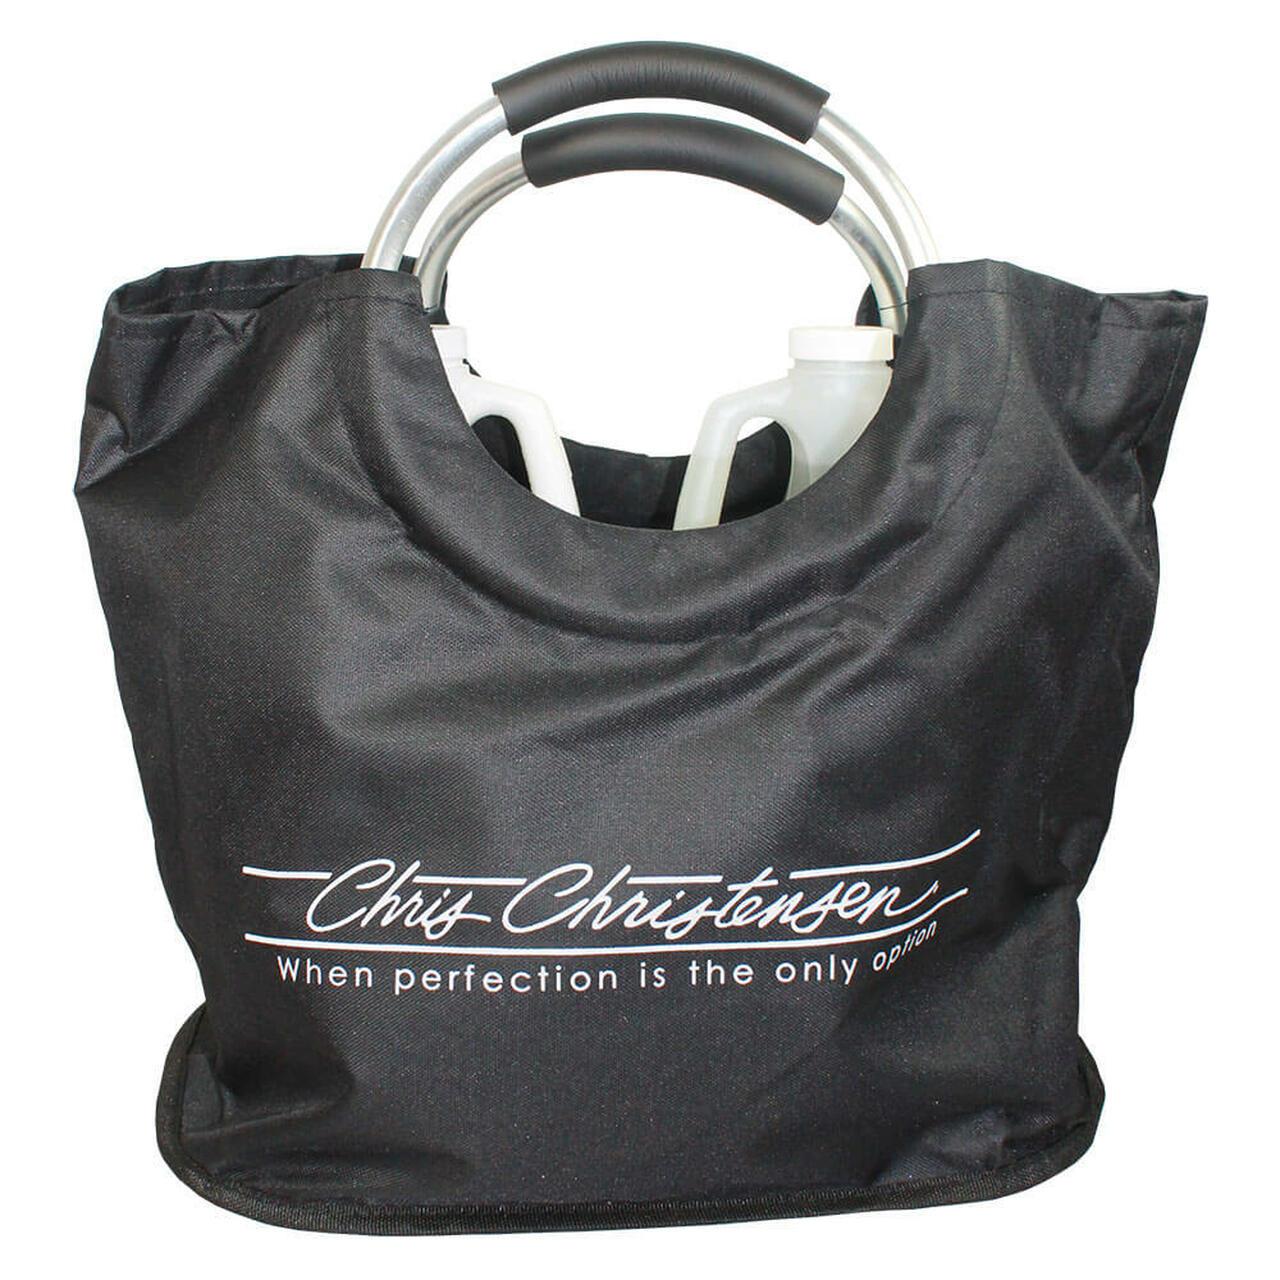 CC - Logo Bag